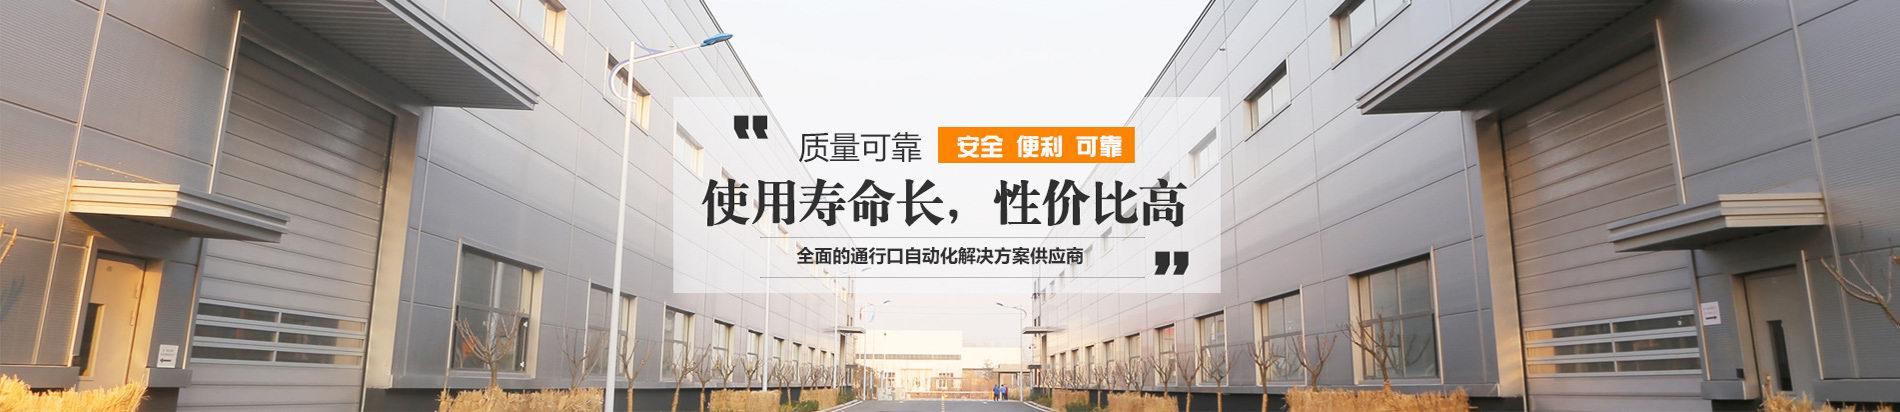 raybetlei竞技门业(洛阳)有限gongsi